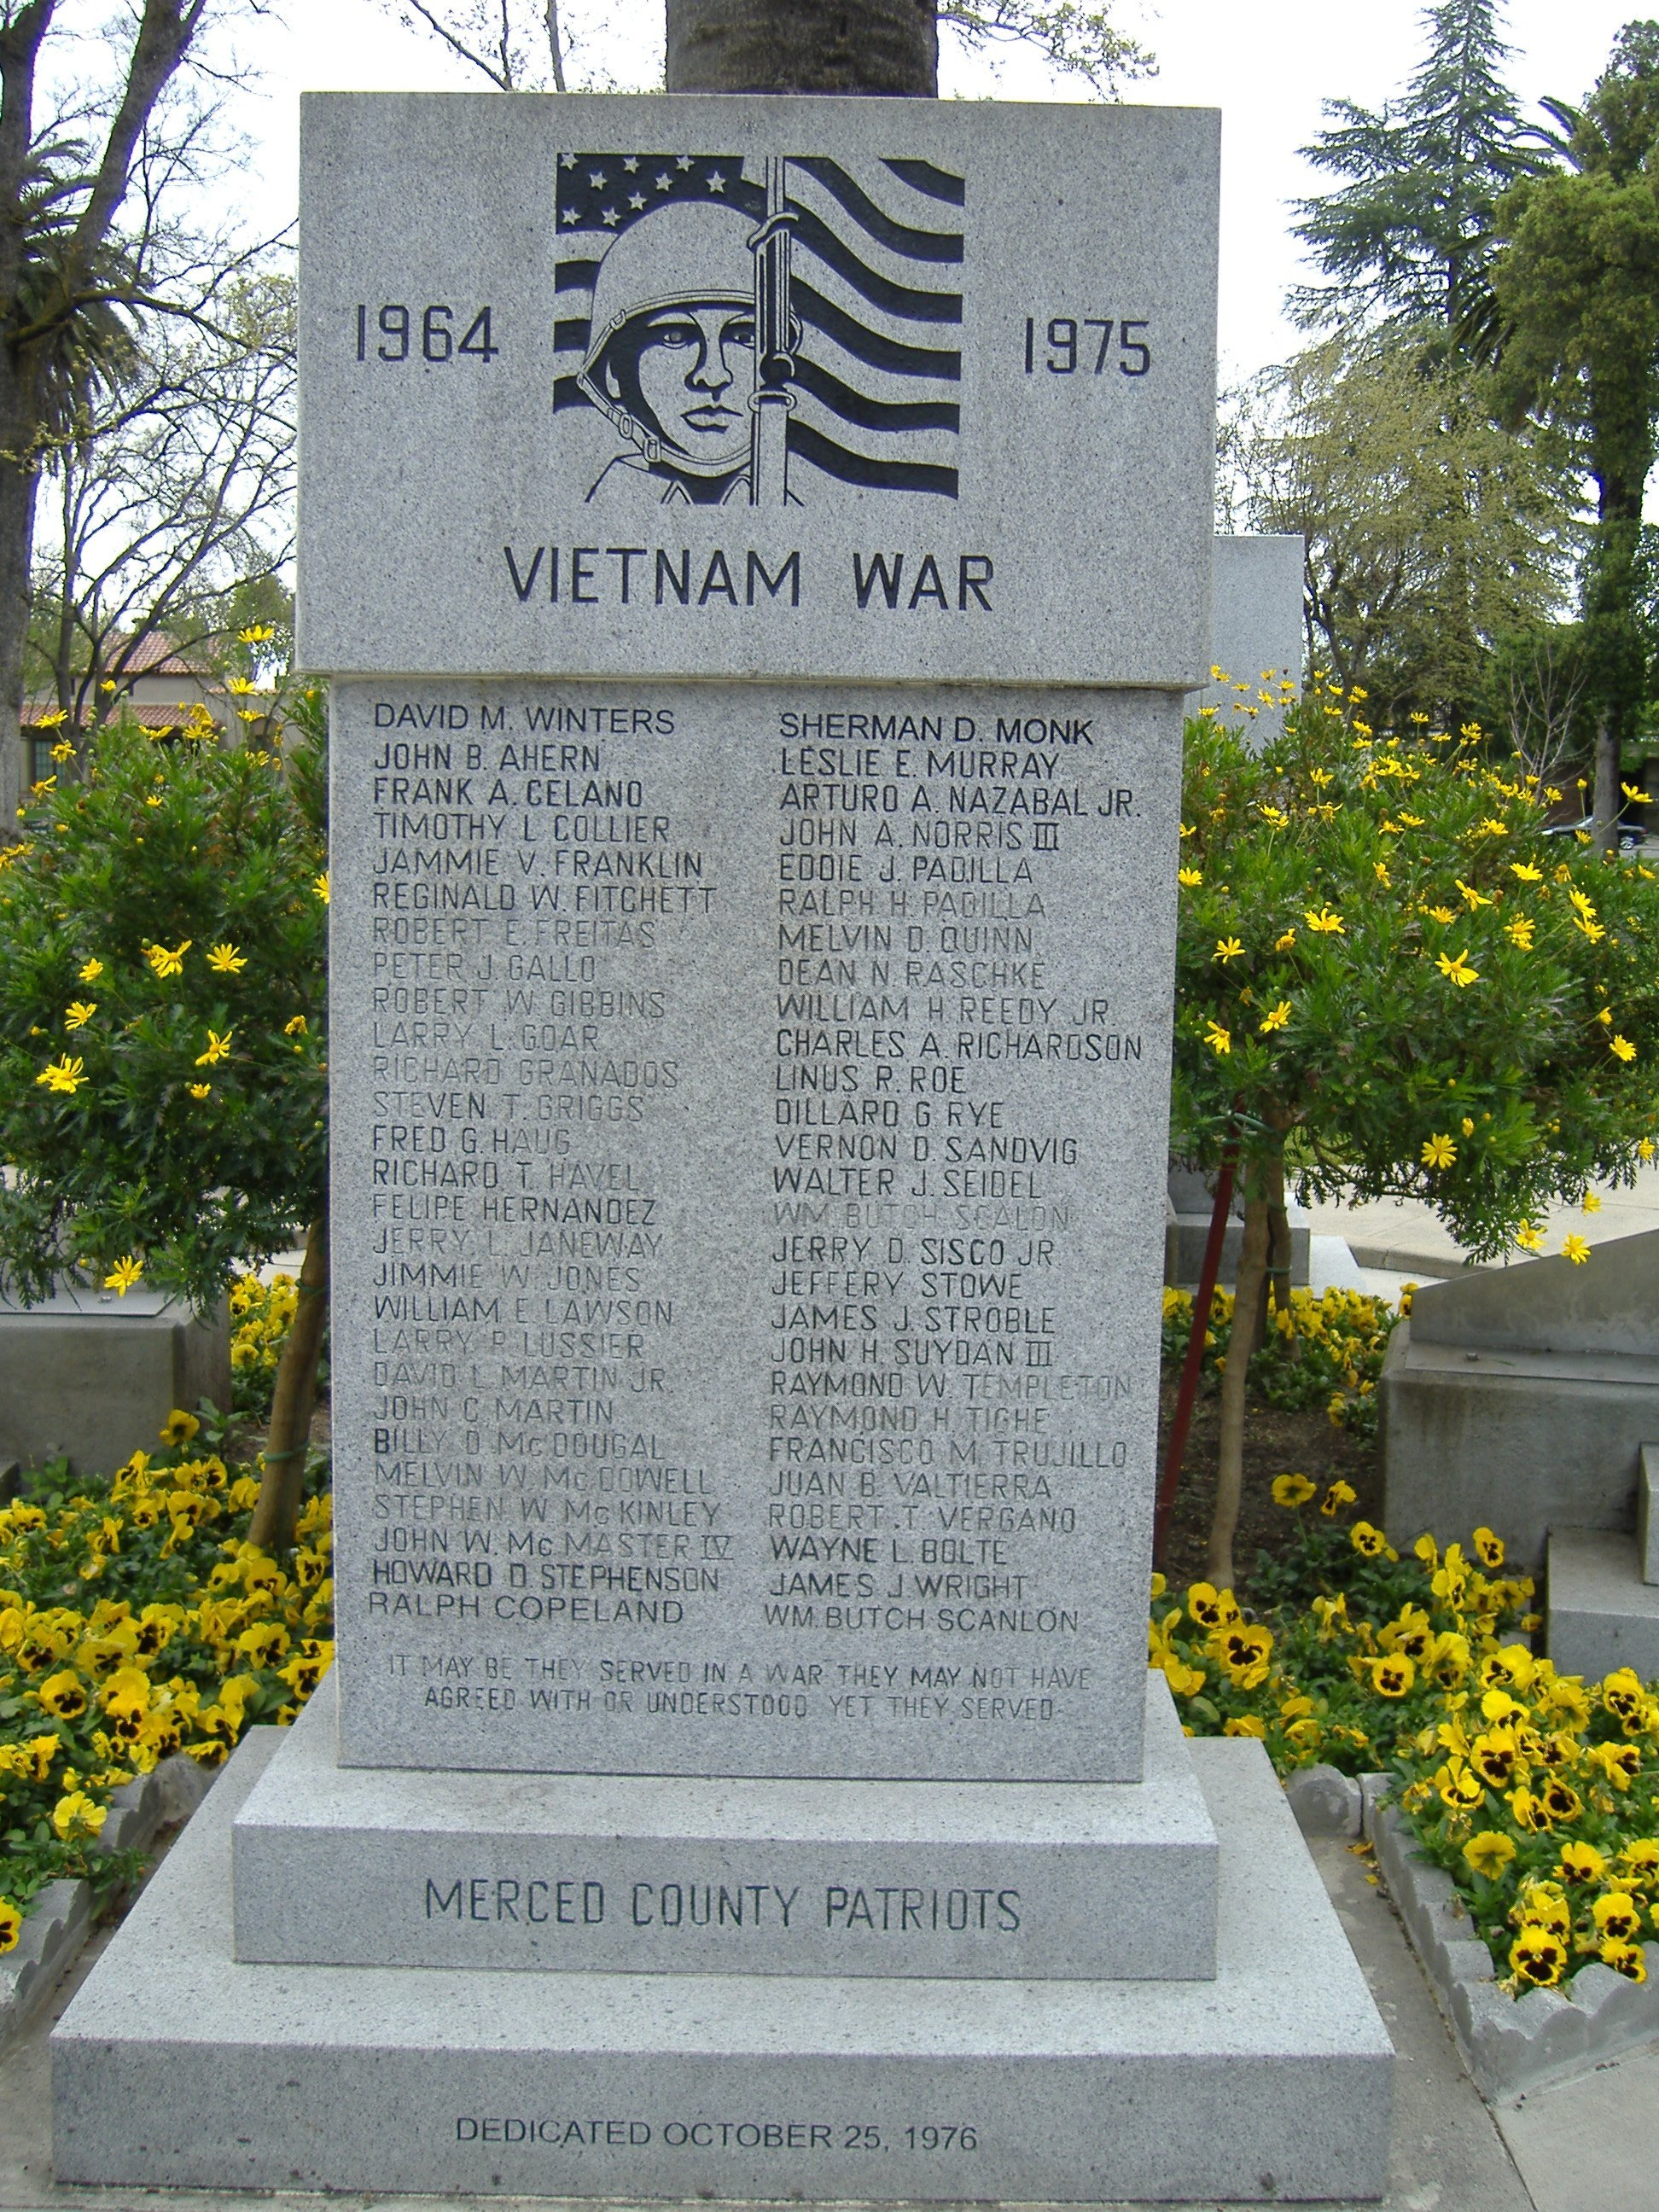 Vietnam War Memorial Washington File:vietnam War Memorial